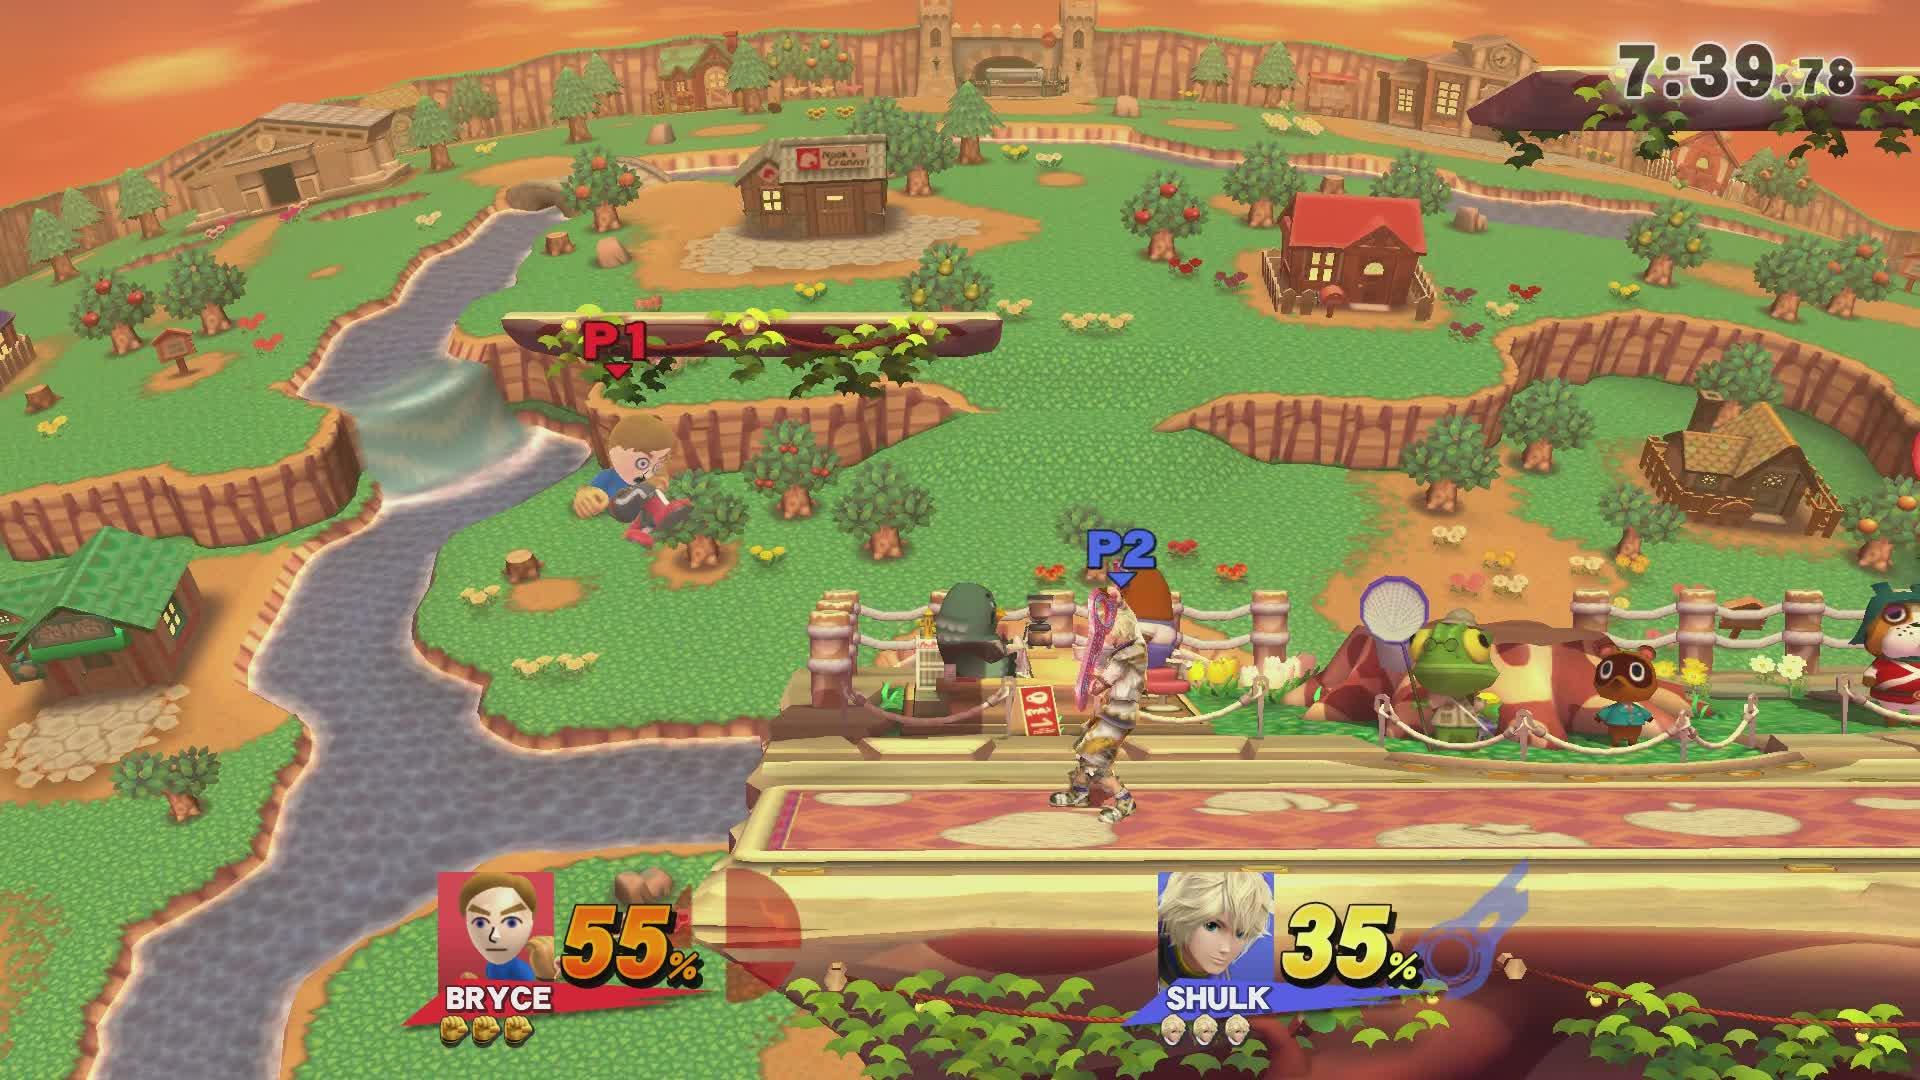 smashgifs, Super Smash Bros for Wii U - My Great Capture - 2018-05-08 19-26-25 GIFs